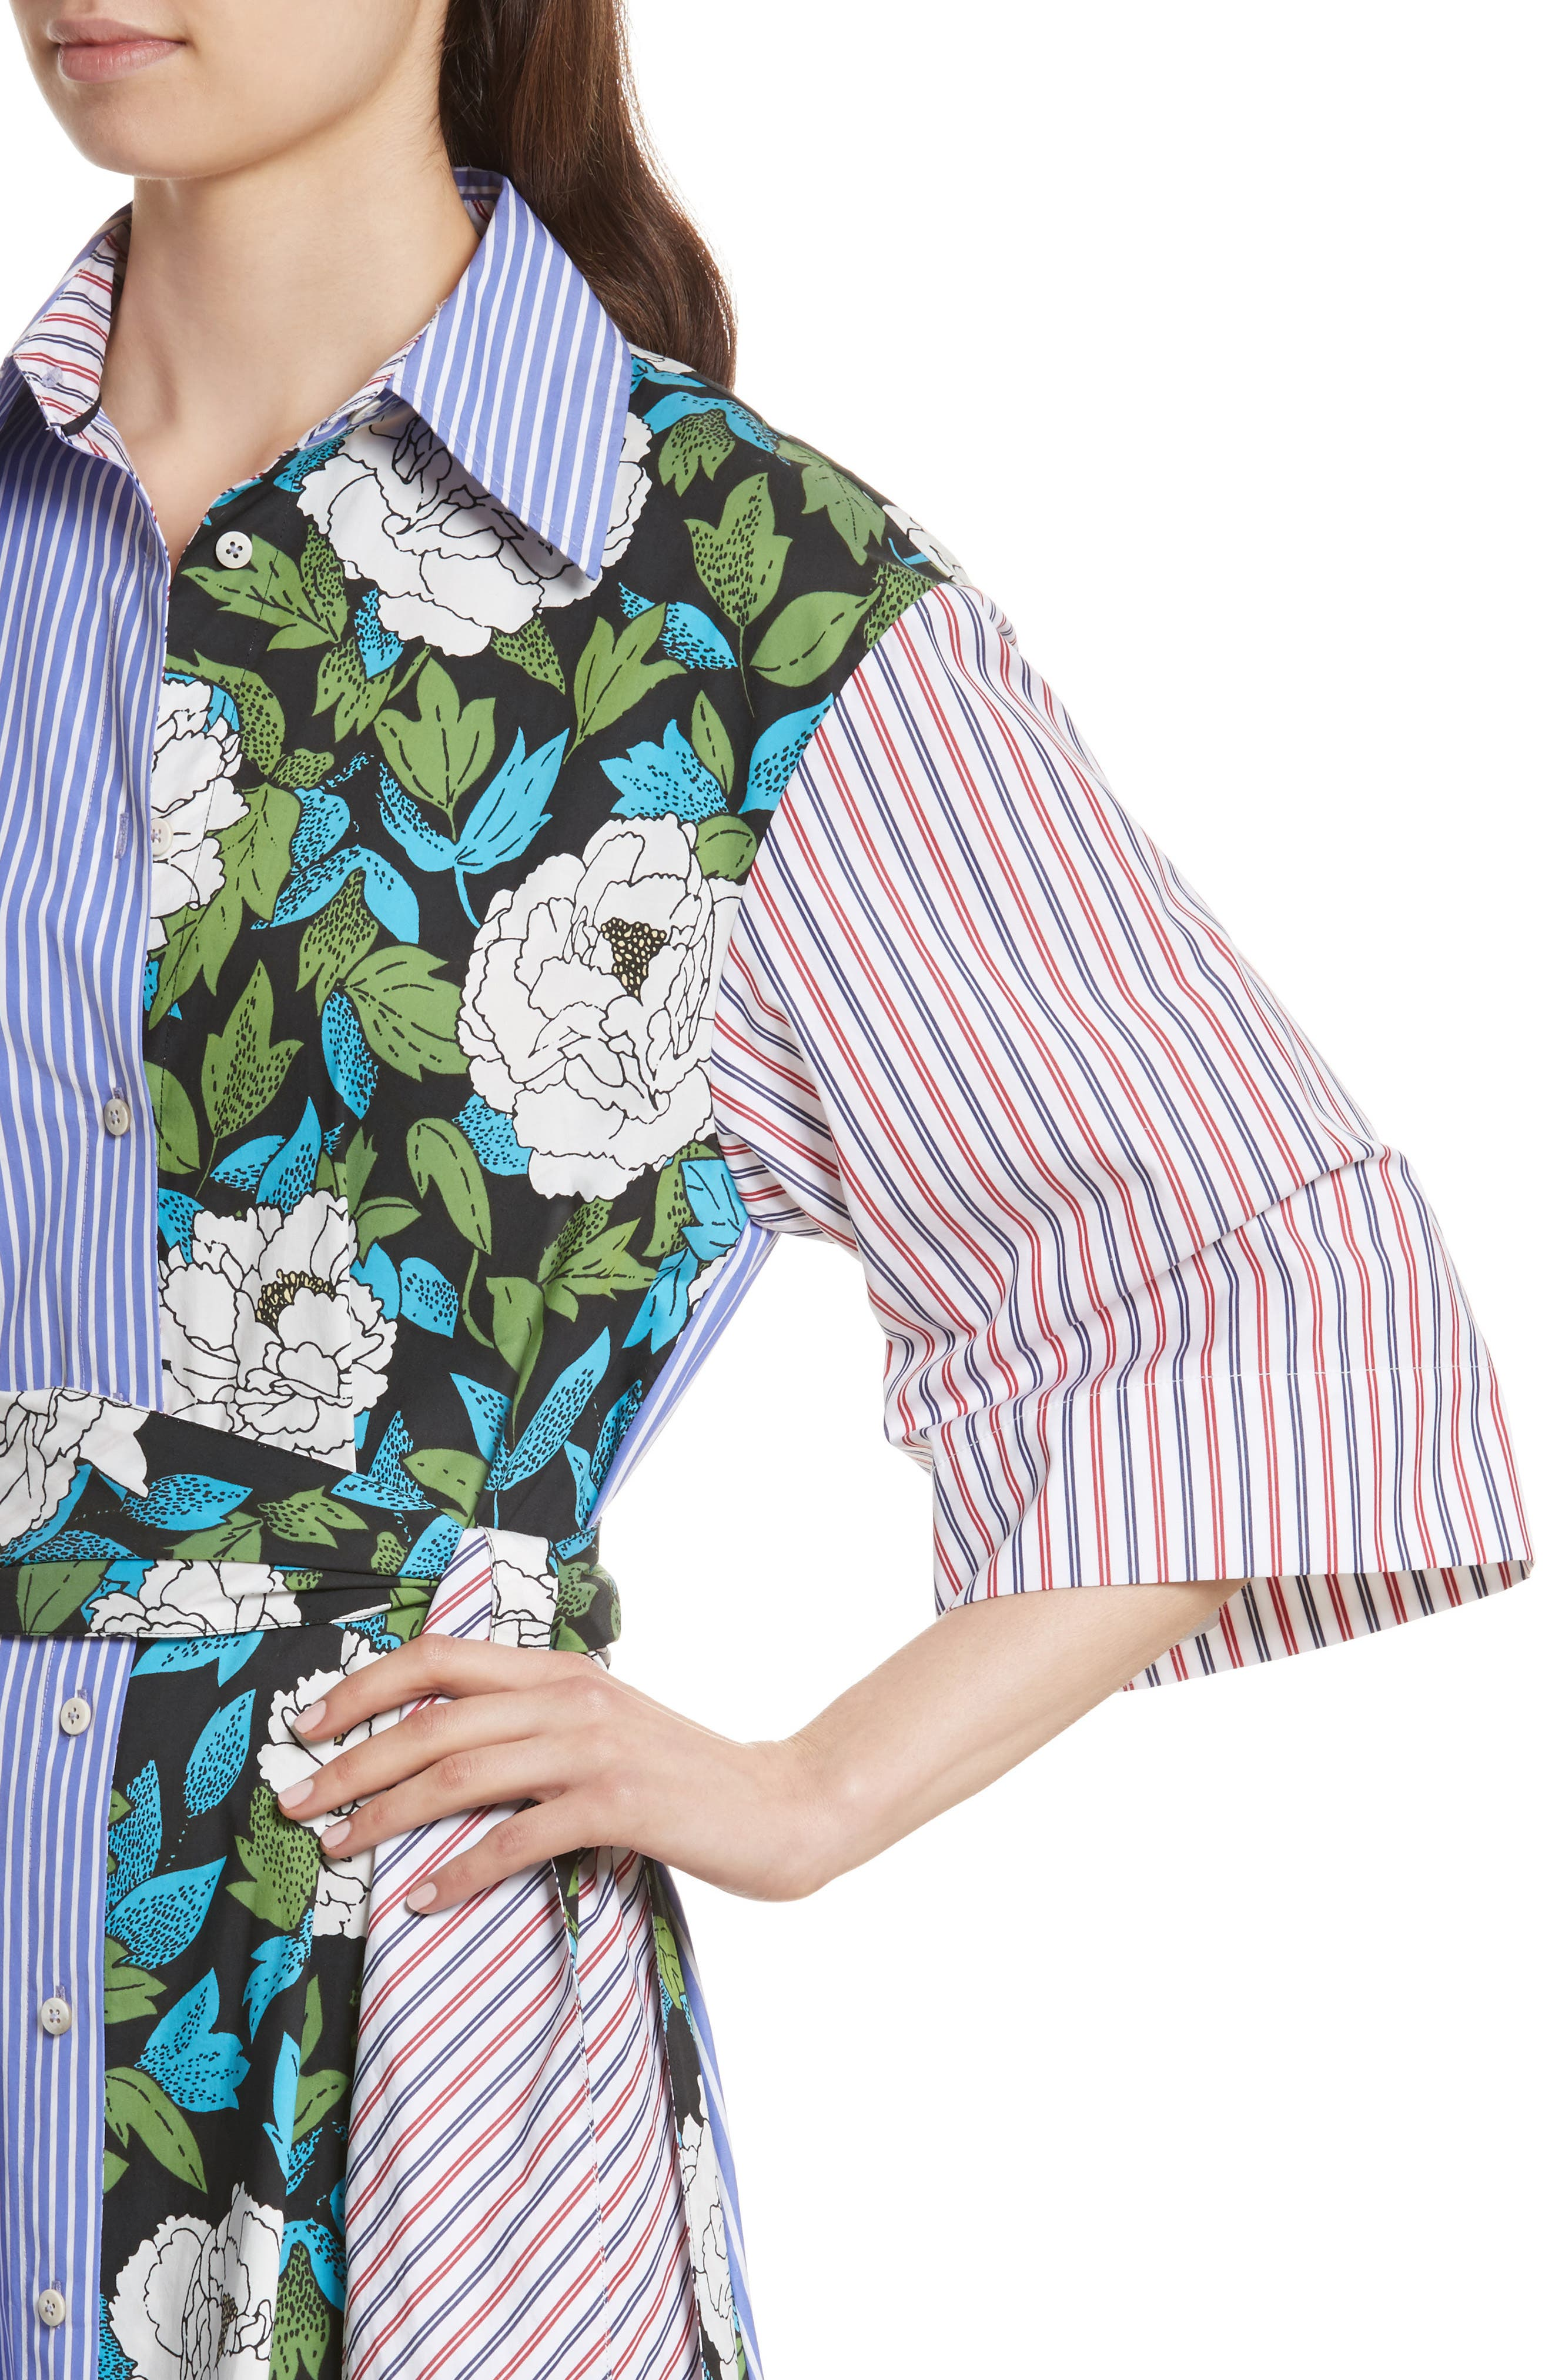 Diane von Furstenberg Mixed Print Cotton Shirtdress,                             Alternate thumbnail 4, color,